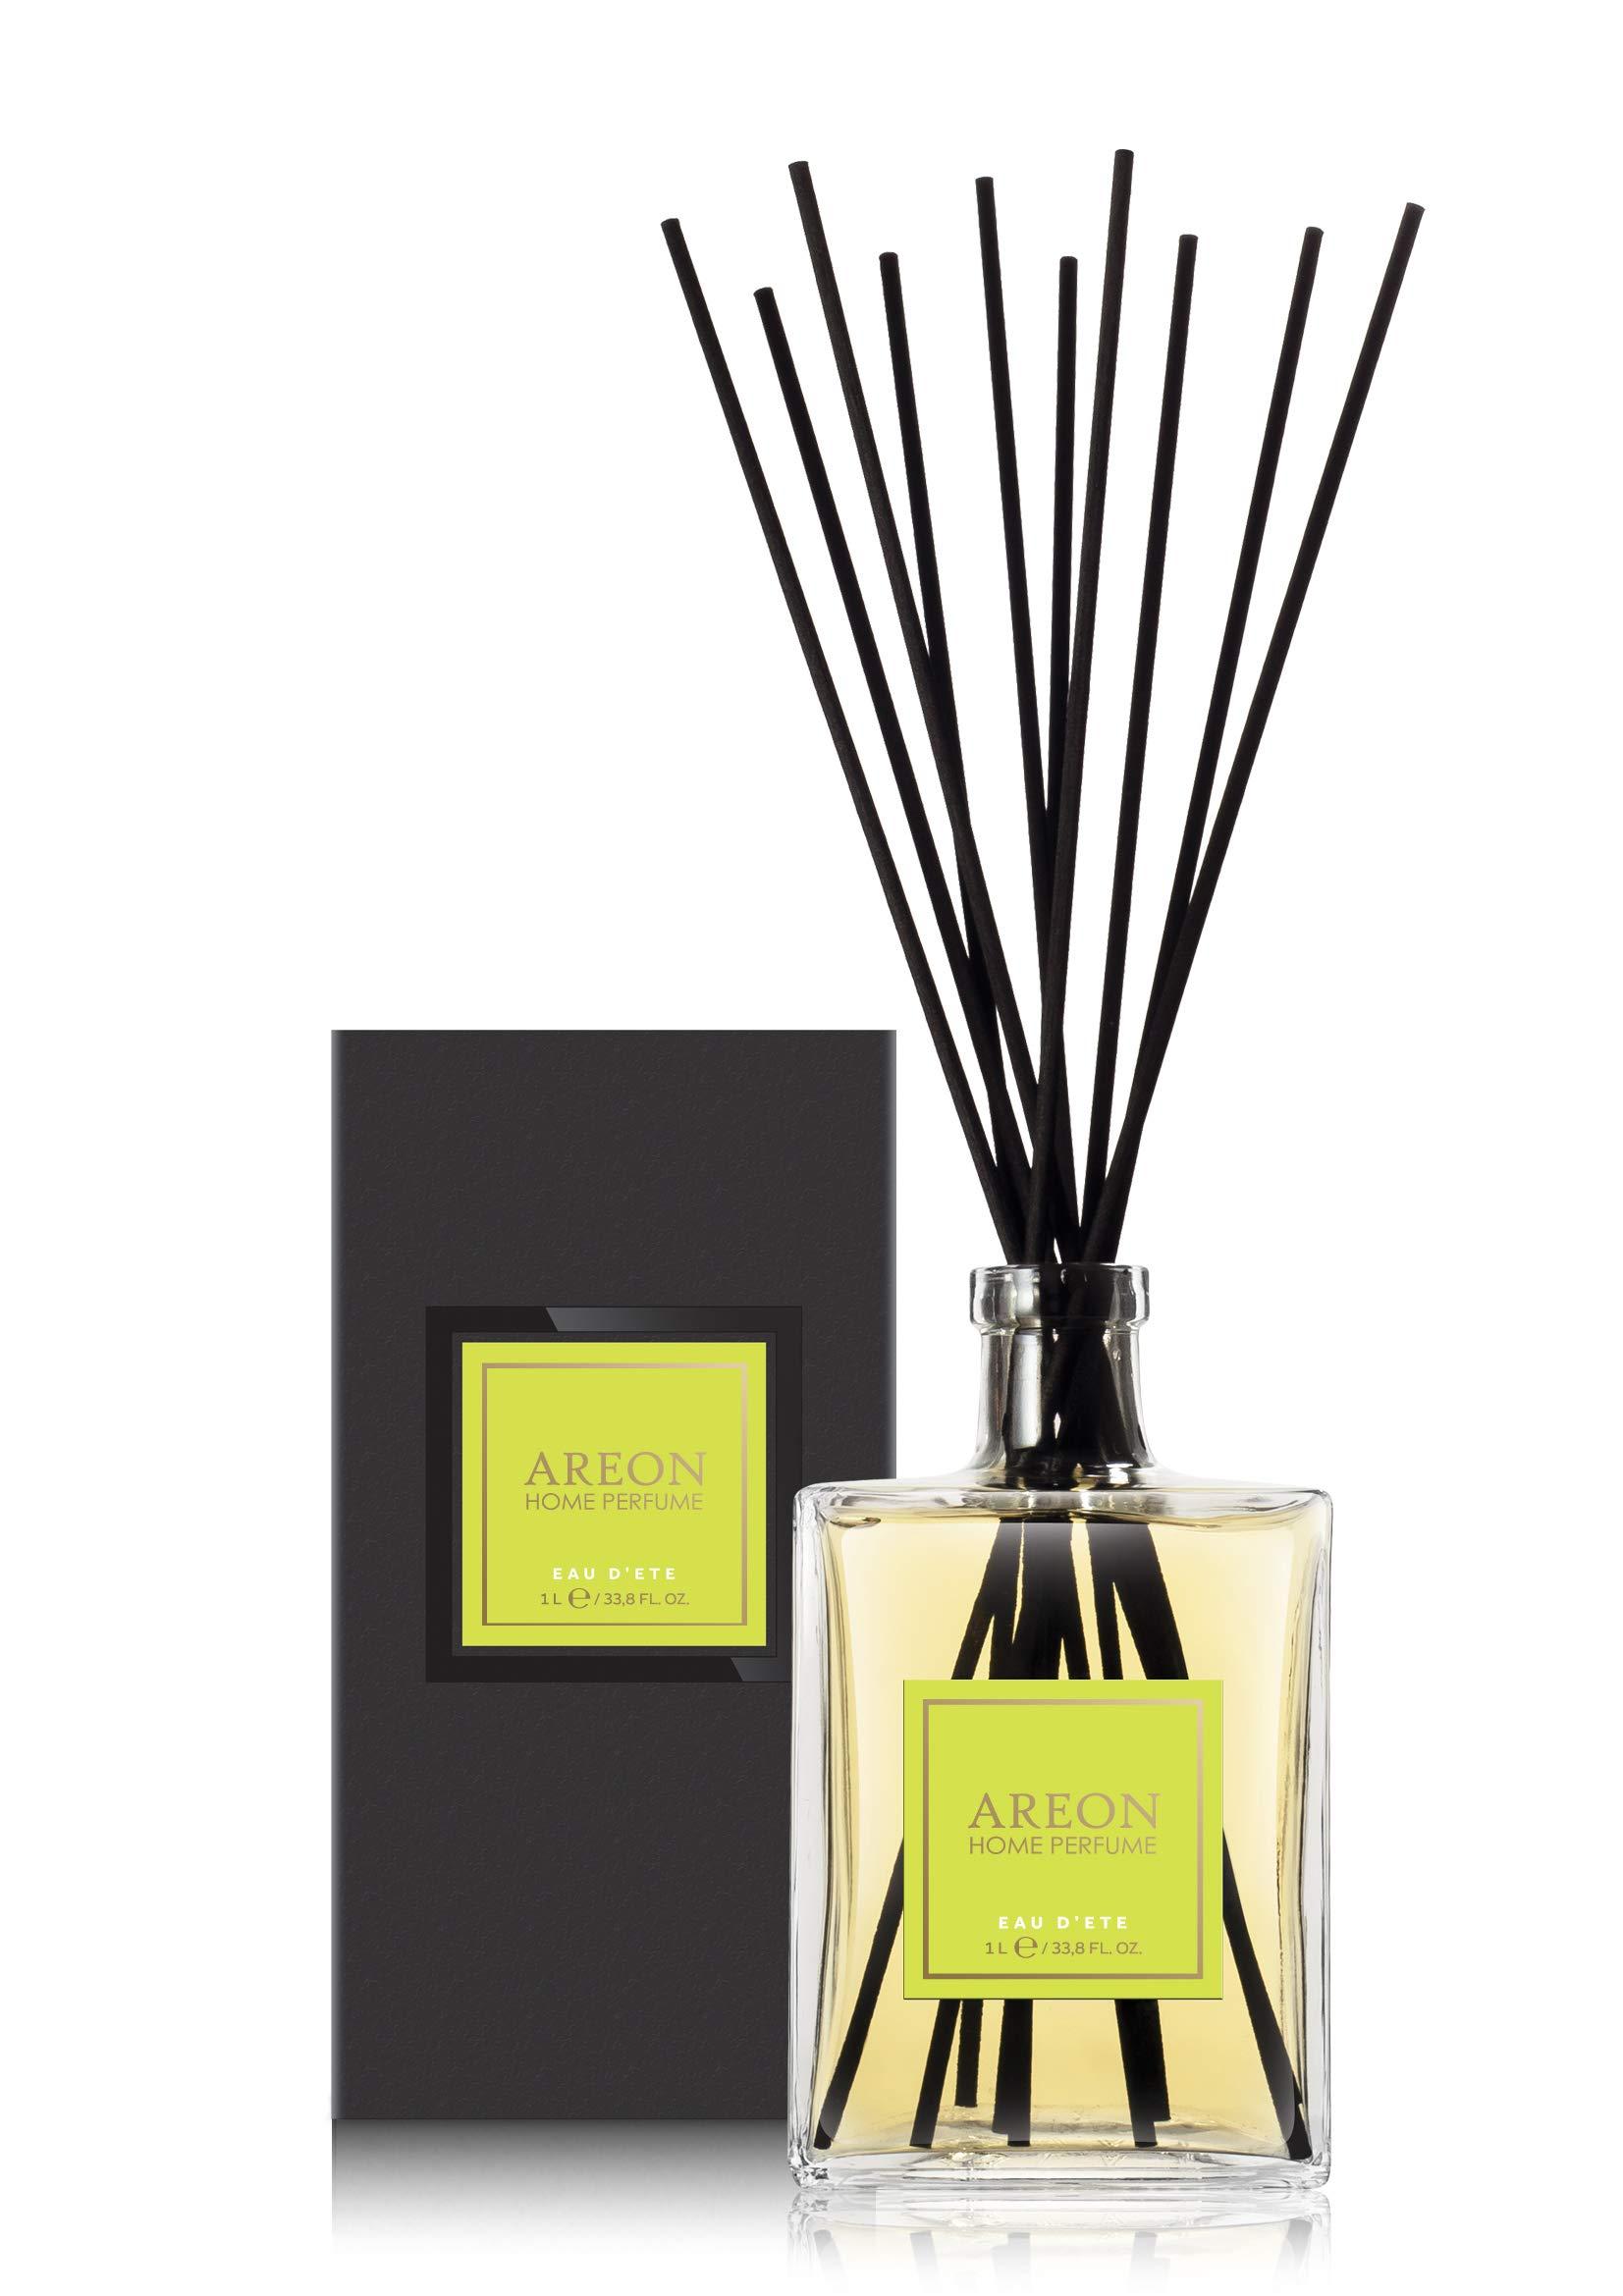 Areon Home Perfume Sticks - 1 Liter (34 OZ) Eau D' ETE